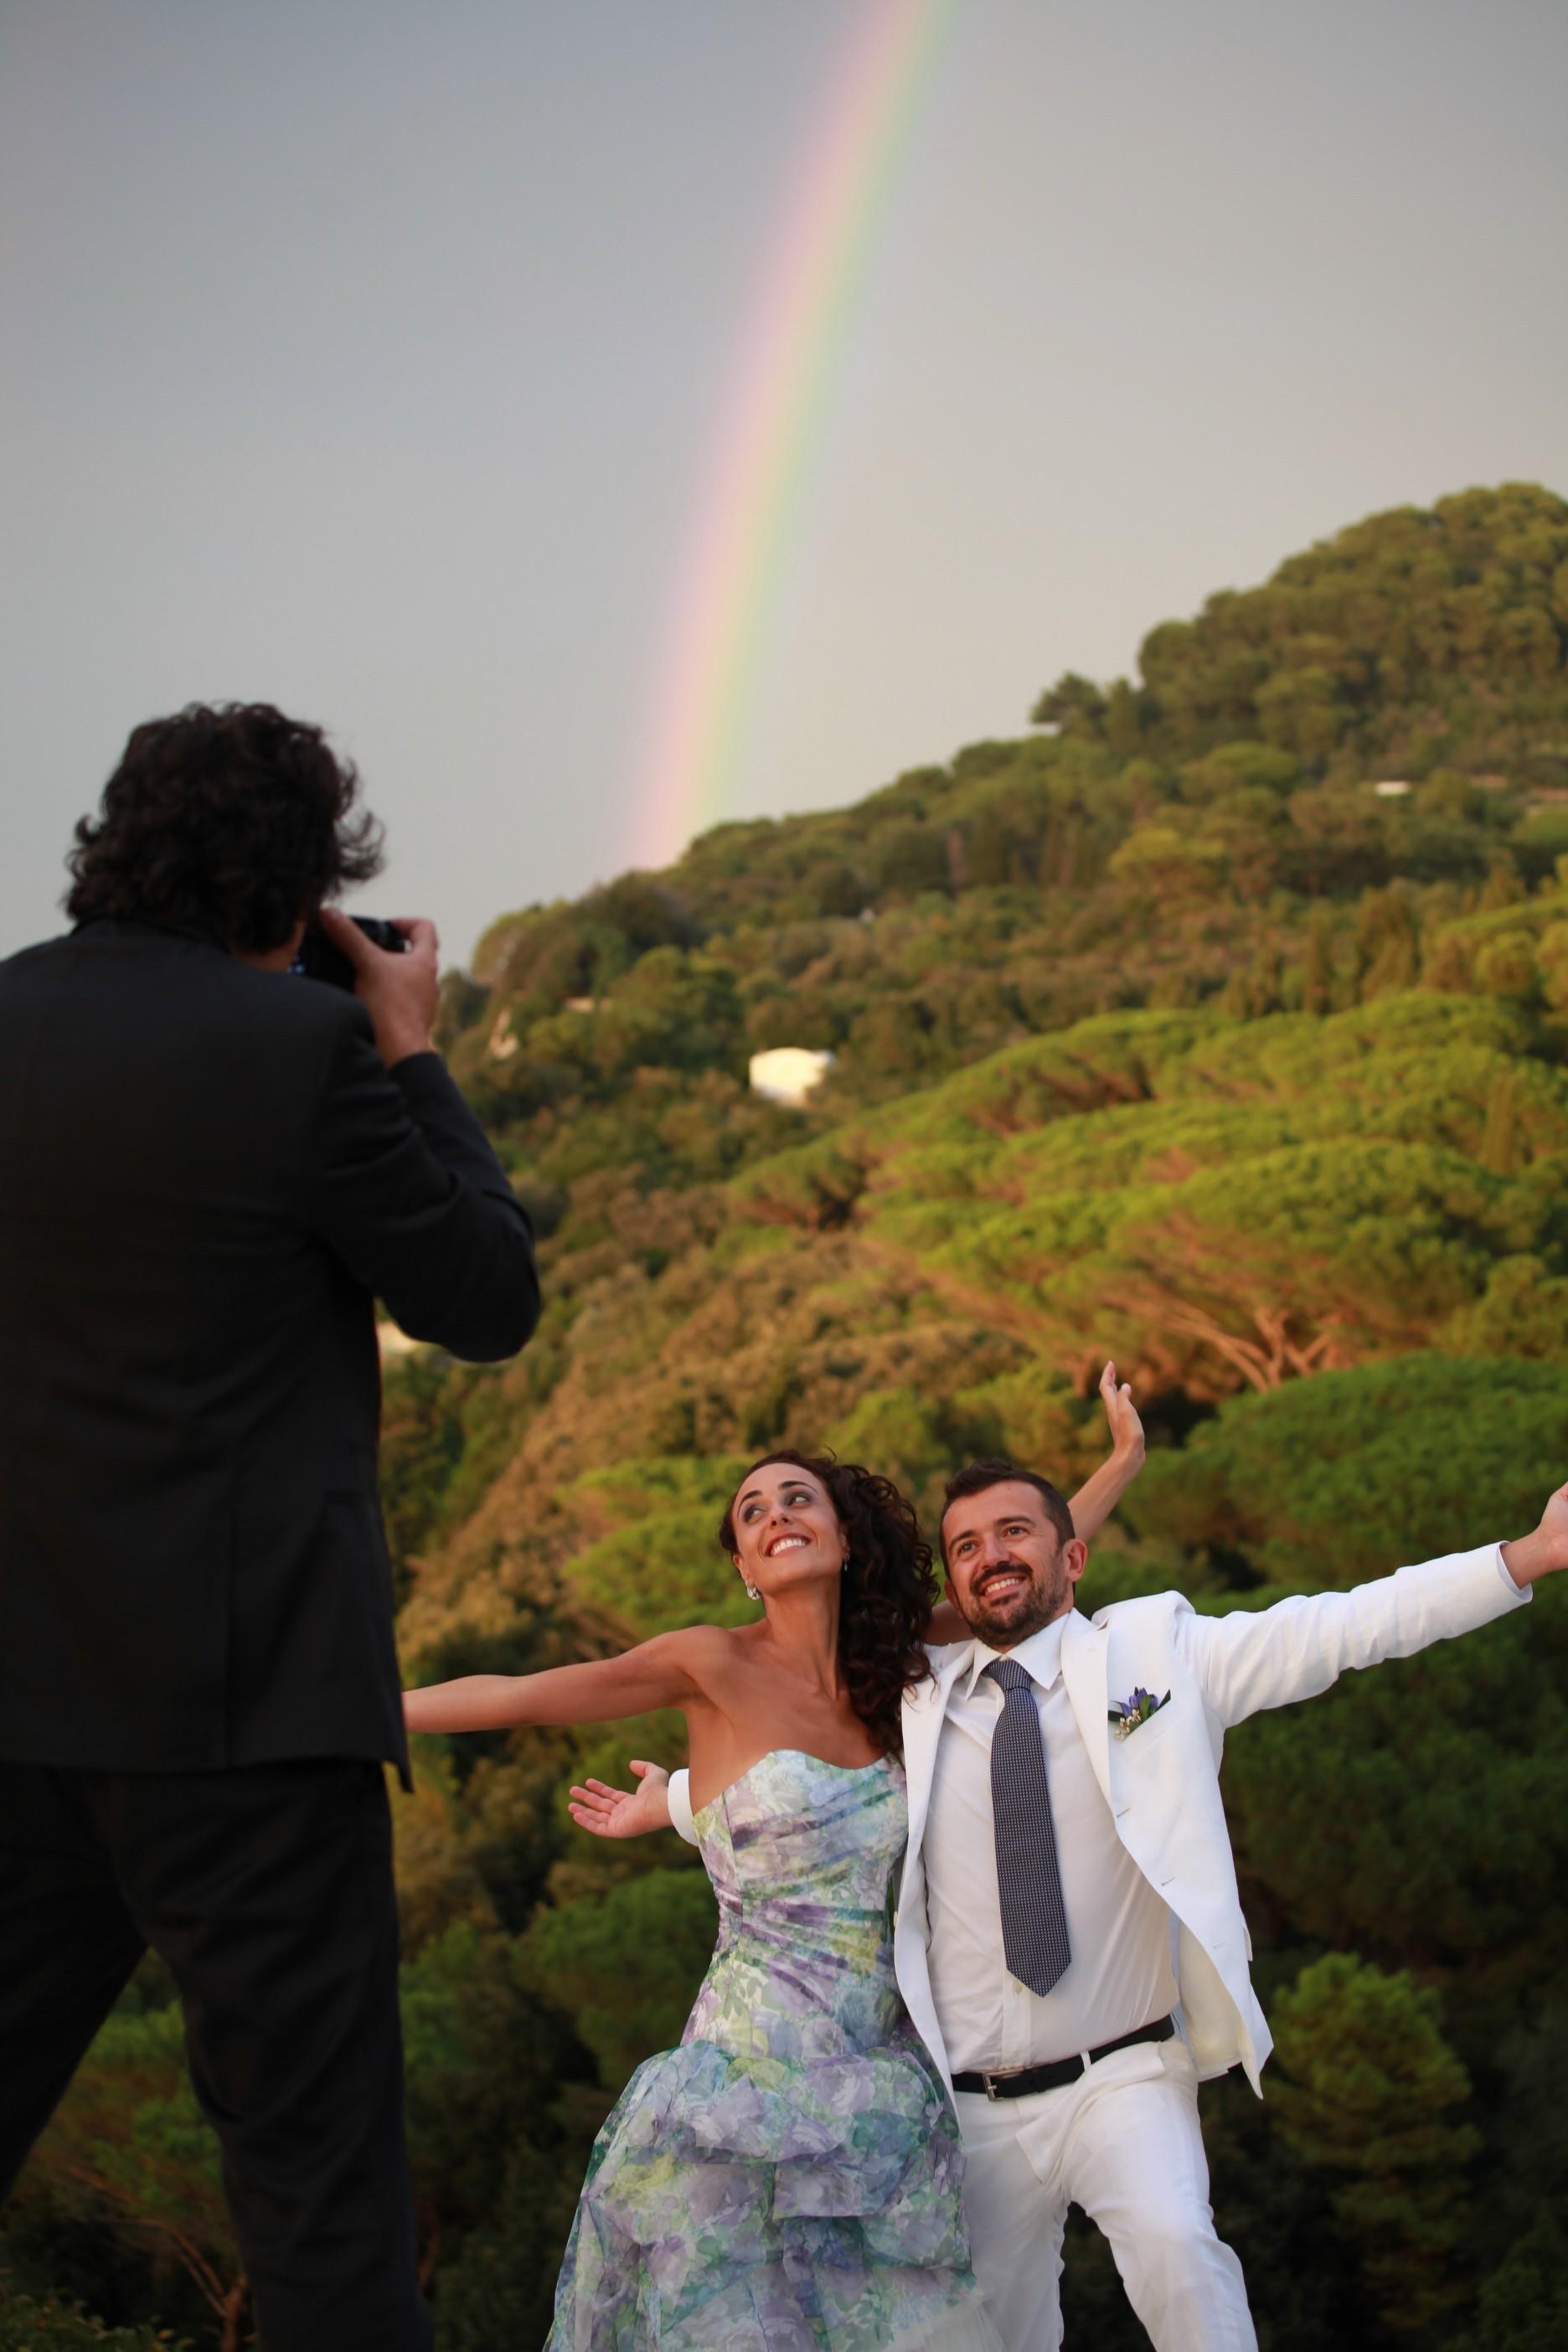 What about an unforgettable wedding in Villa Carolina Capri? info@villacarolinacapri.it